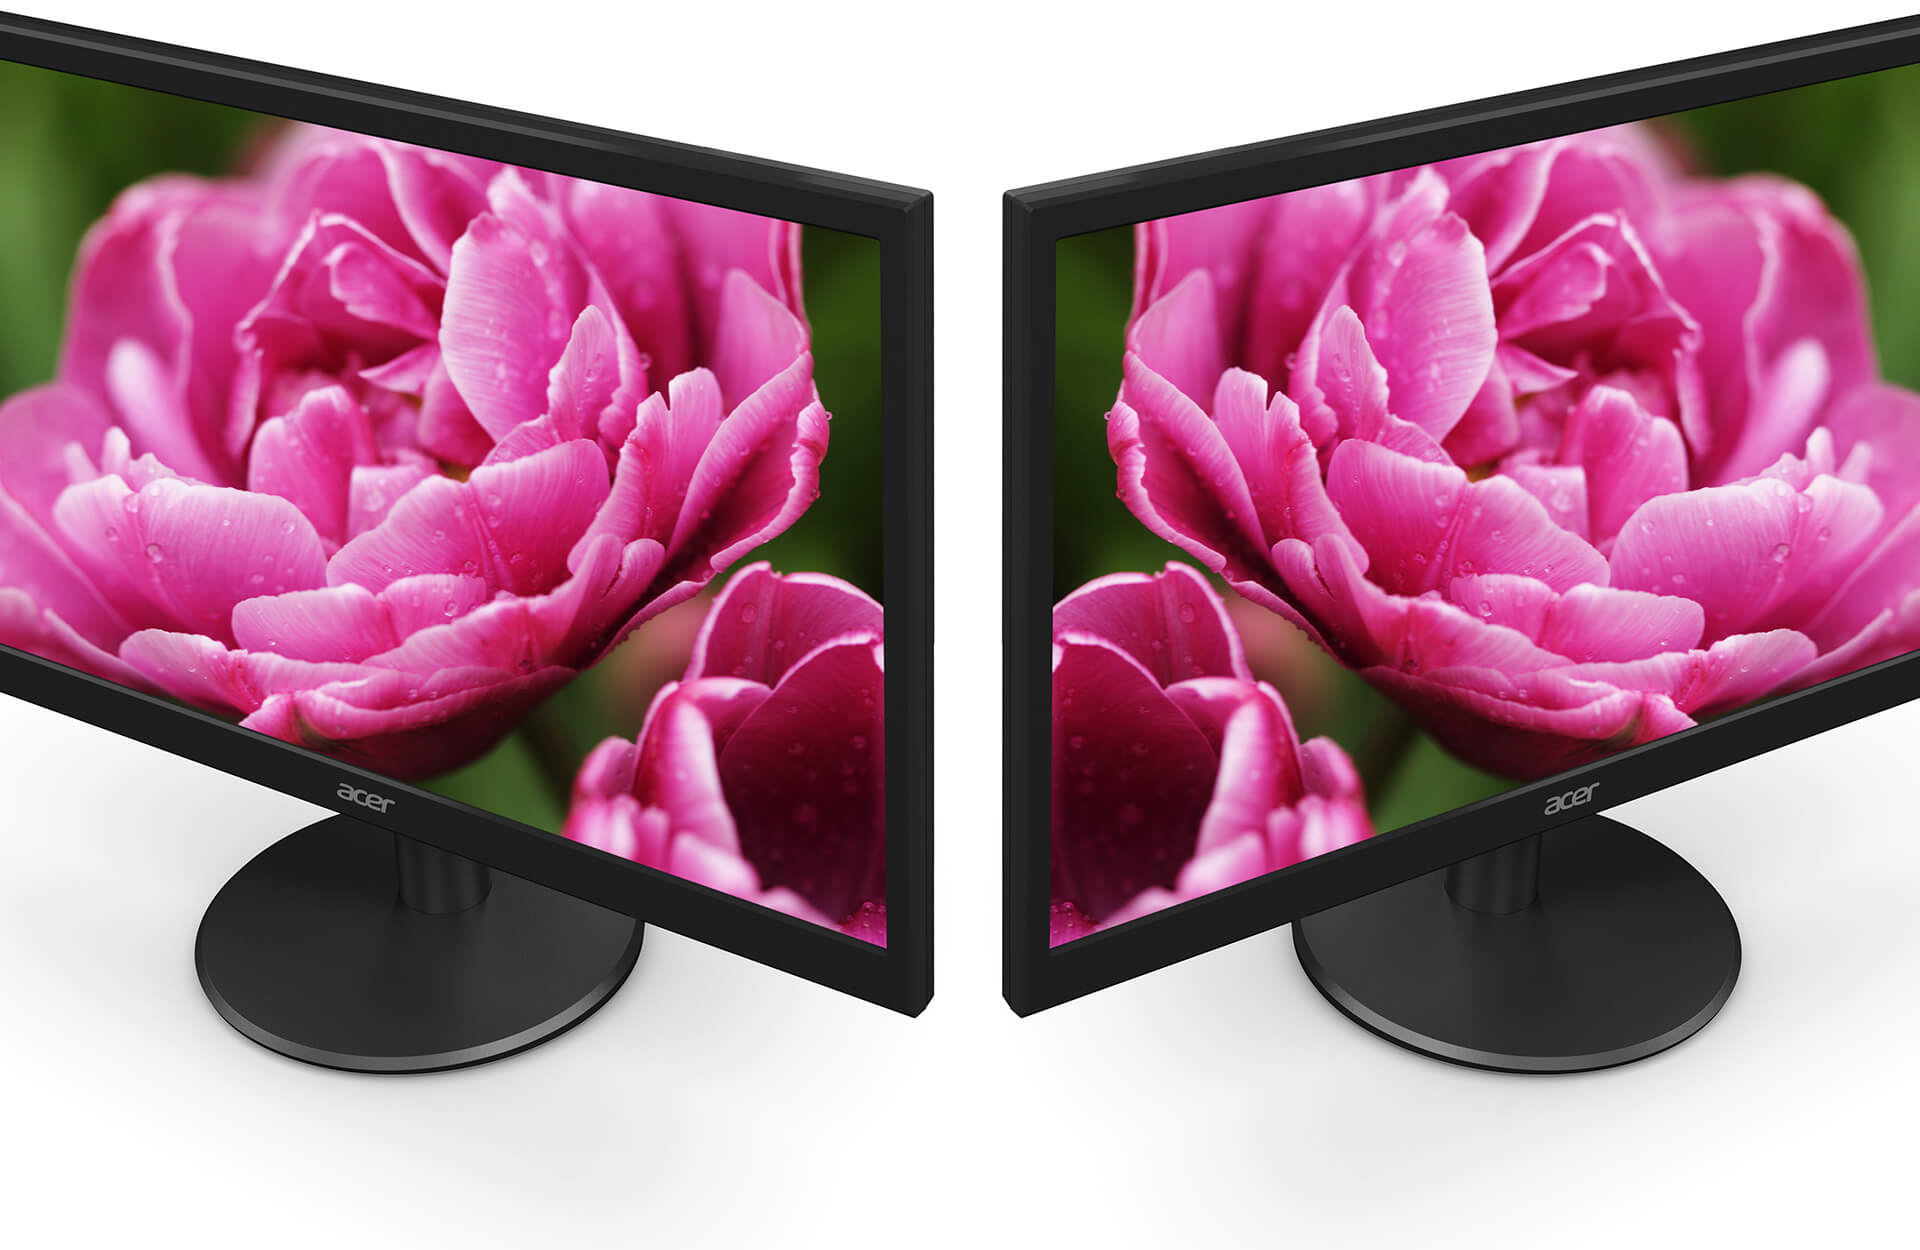 Acer EB2 - 100 Million:1 Contrast ksp - Large